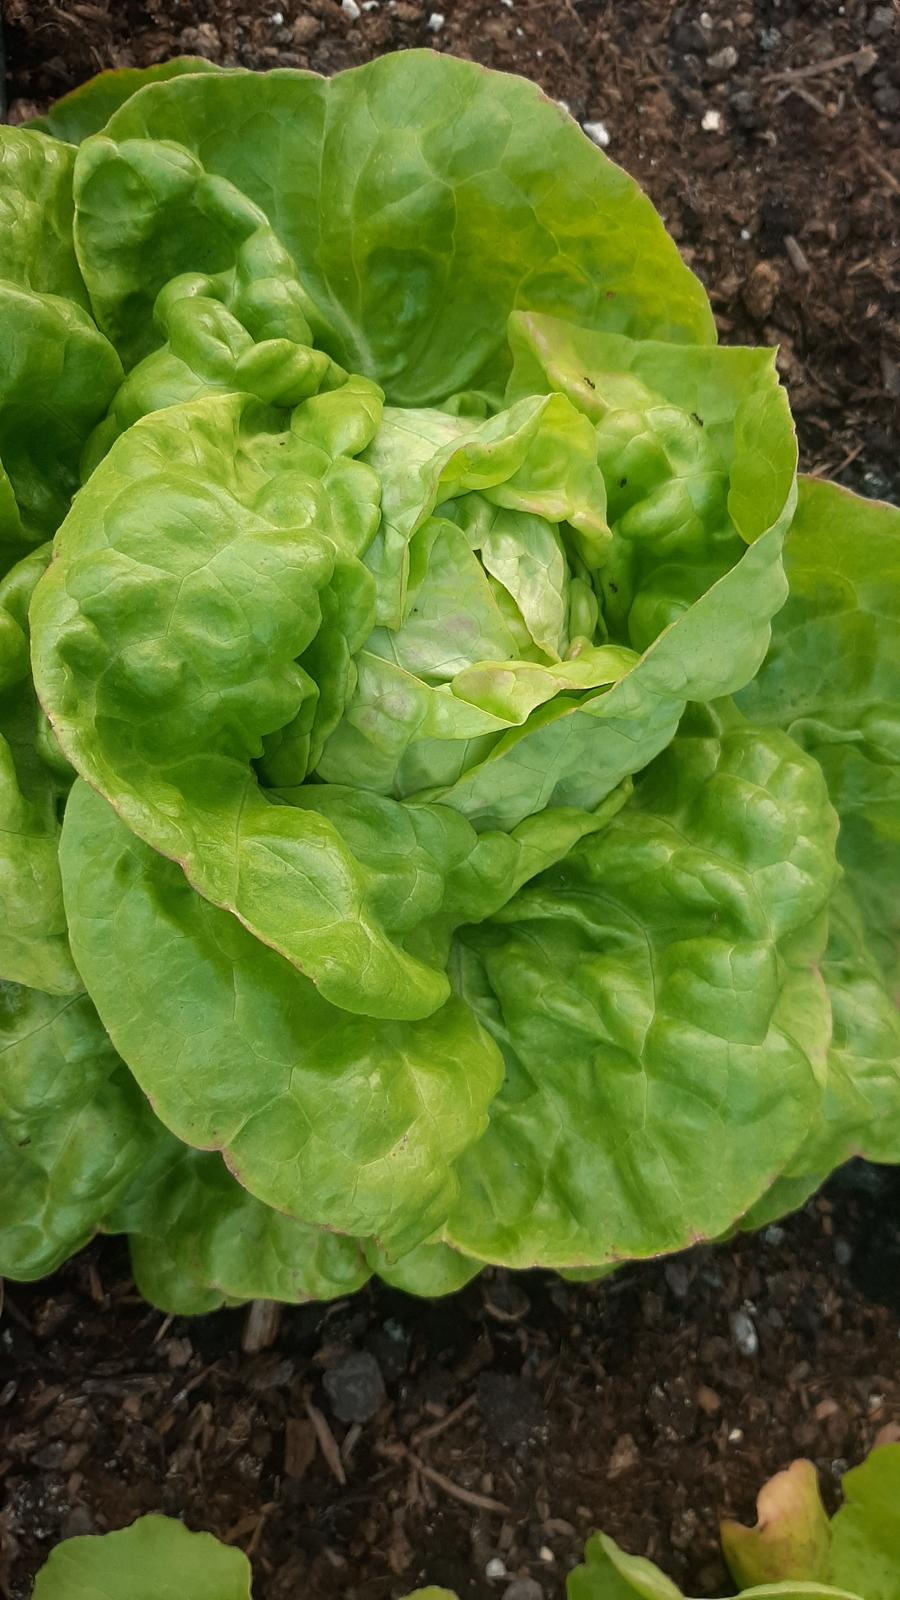 🏠🌞🌺❤🌷 Zahrada a jej dalsi rok...2020 🌱🐞🐛🦋🍓🥕🍅🌺❤ - Salat...tento rok uz pomenej kuskov.